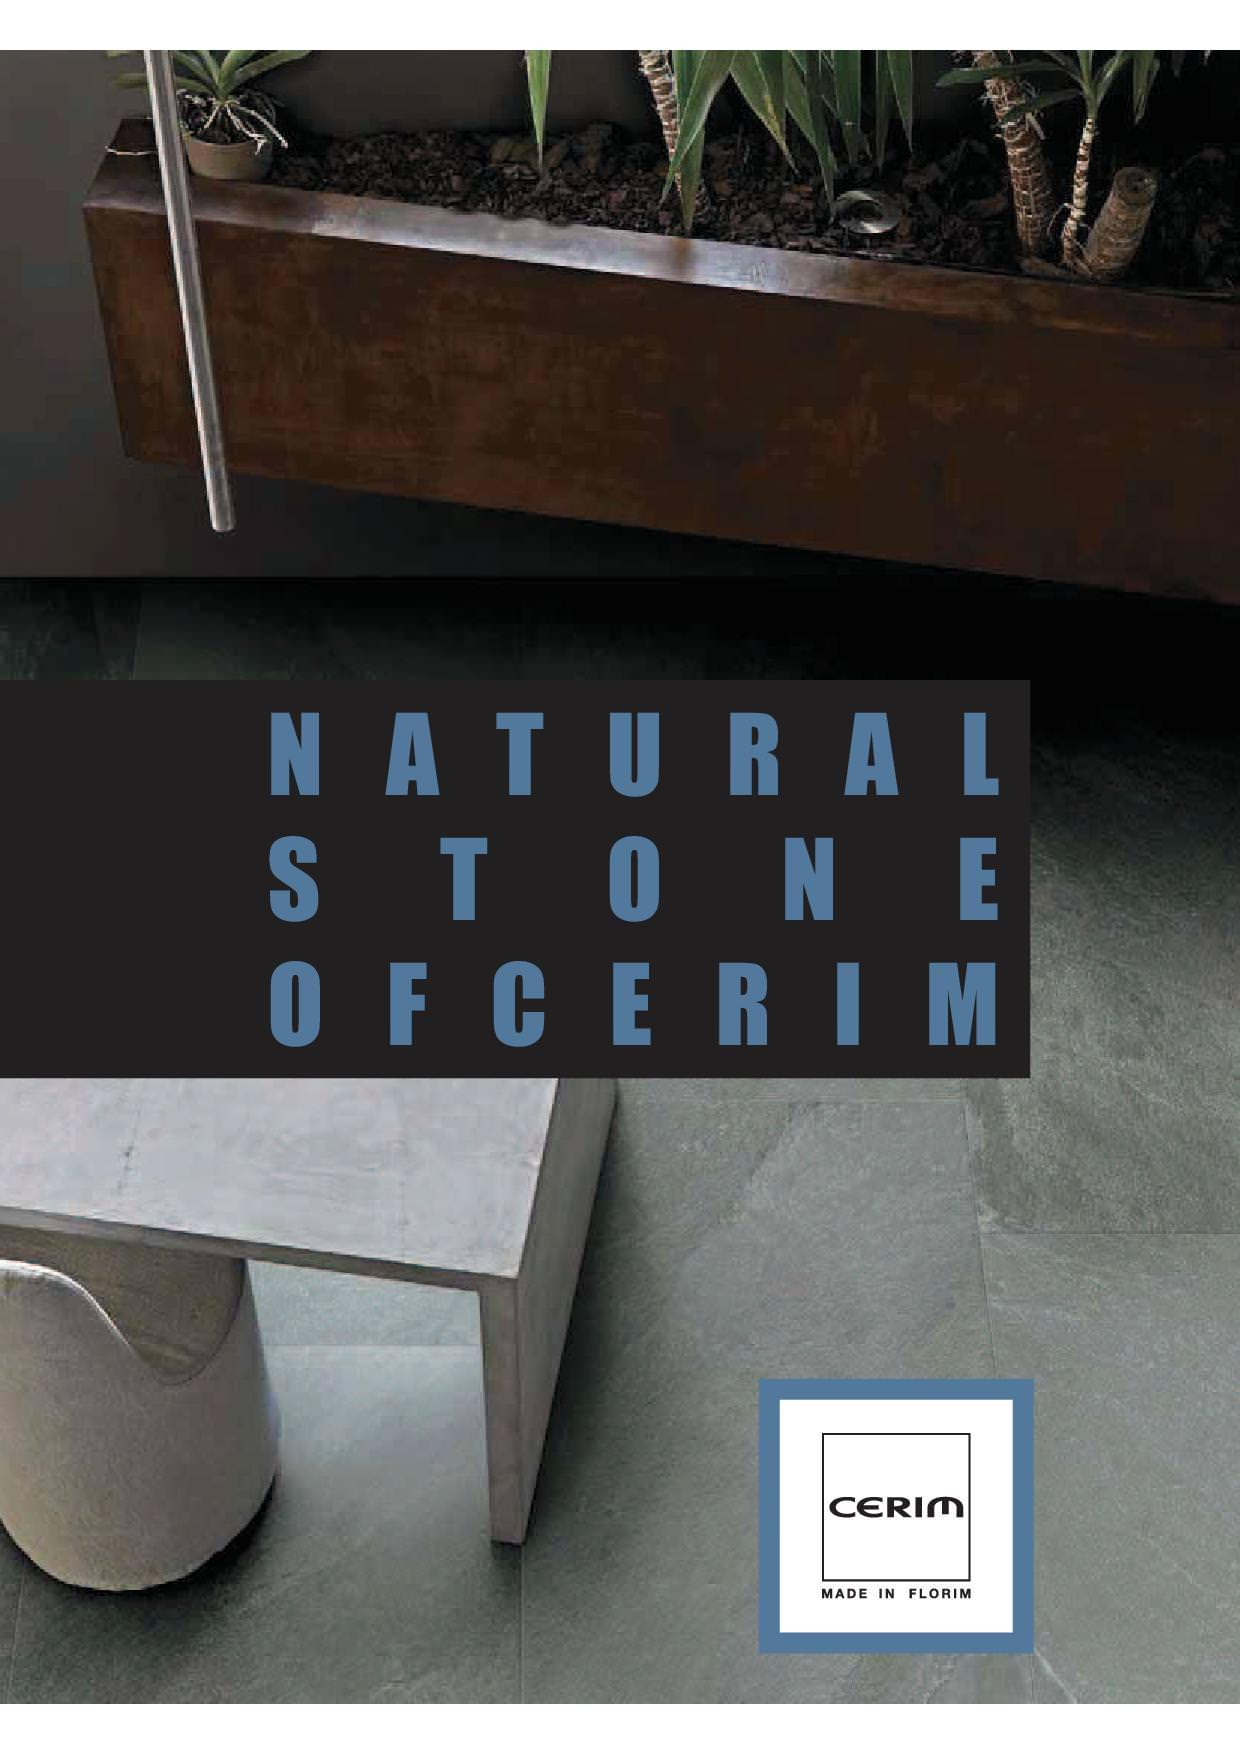 CERIM NATURAL STONE